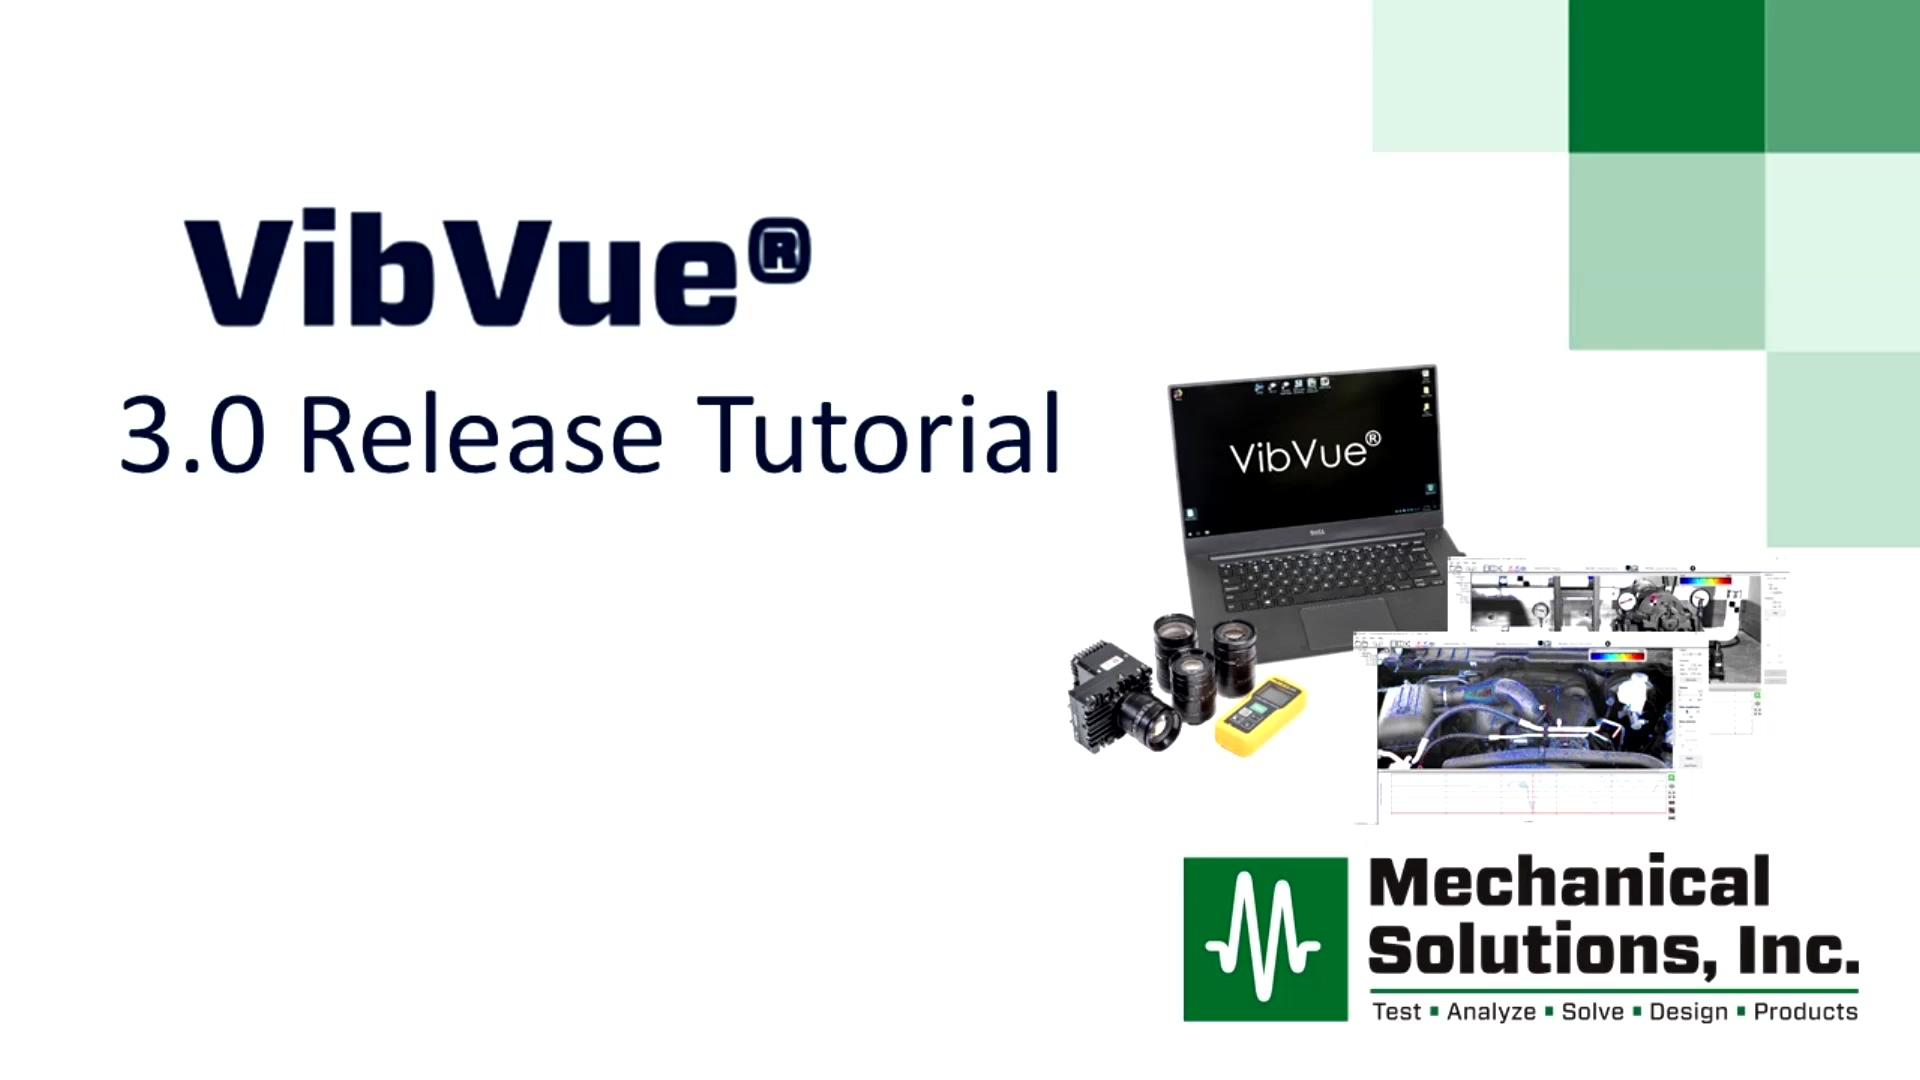 VibVue® 3.0 Release Tutorial